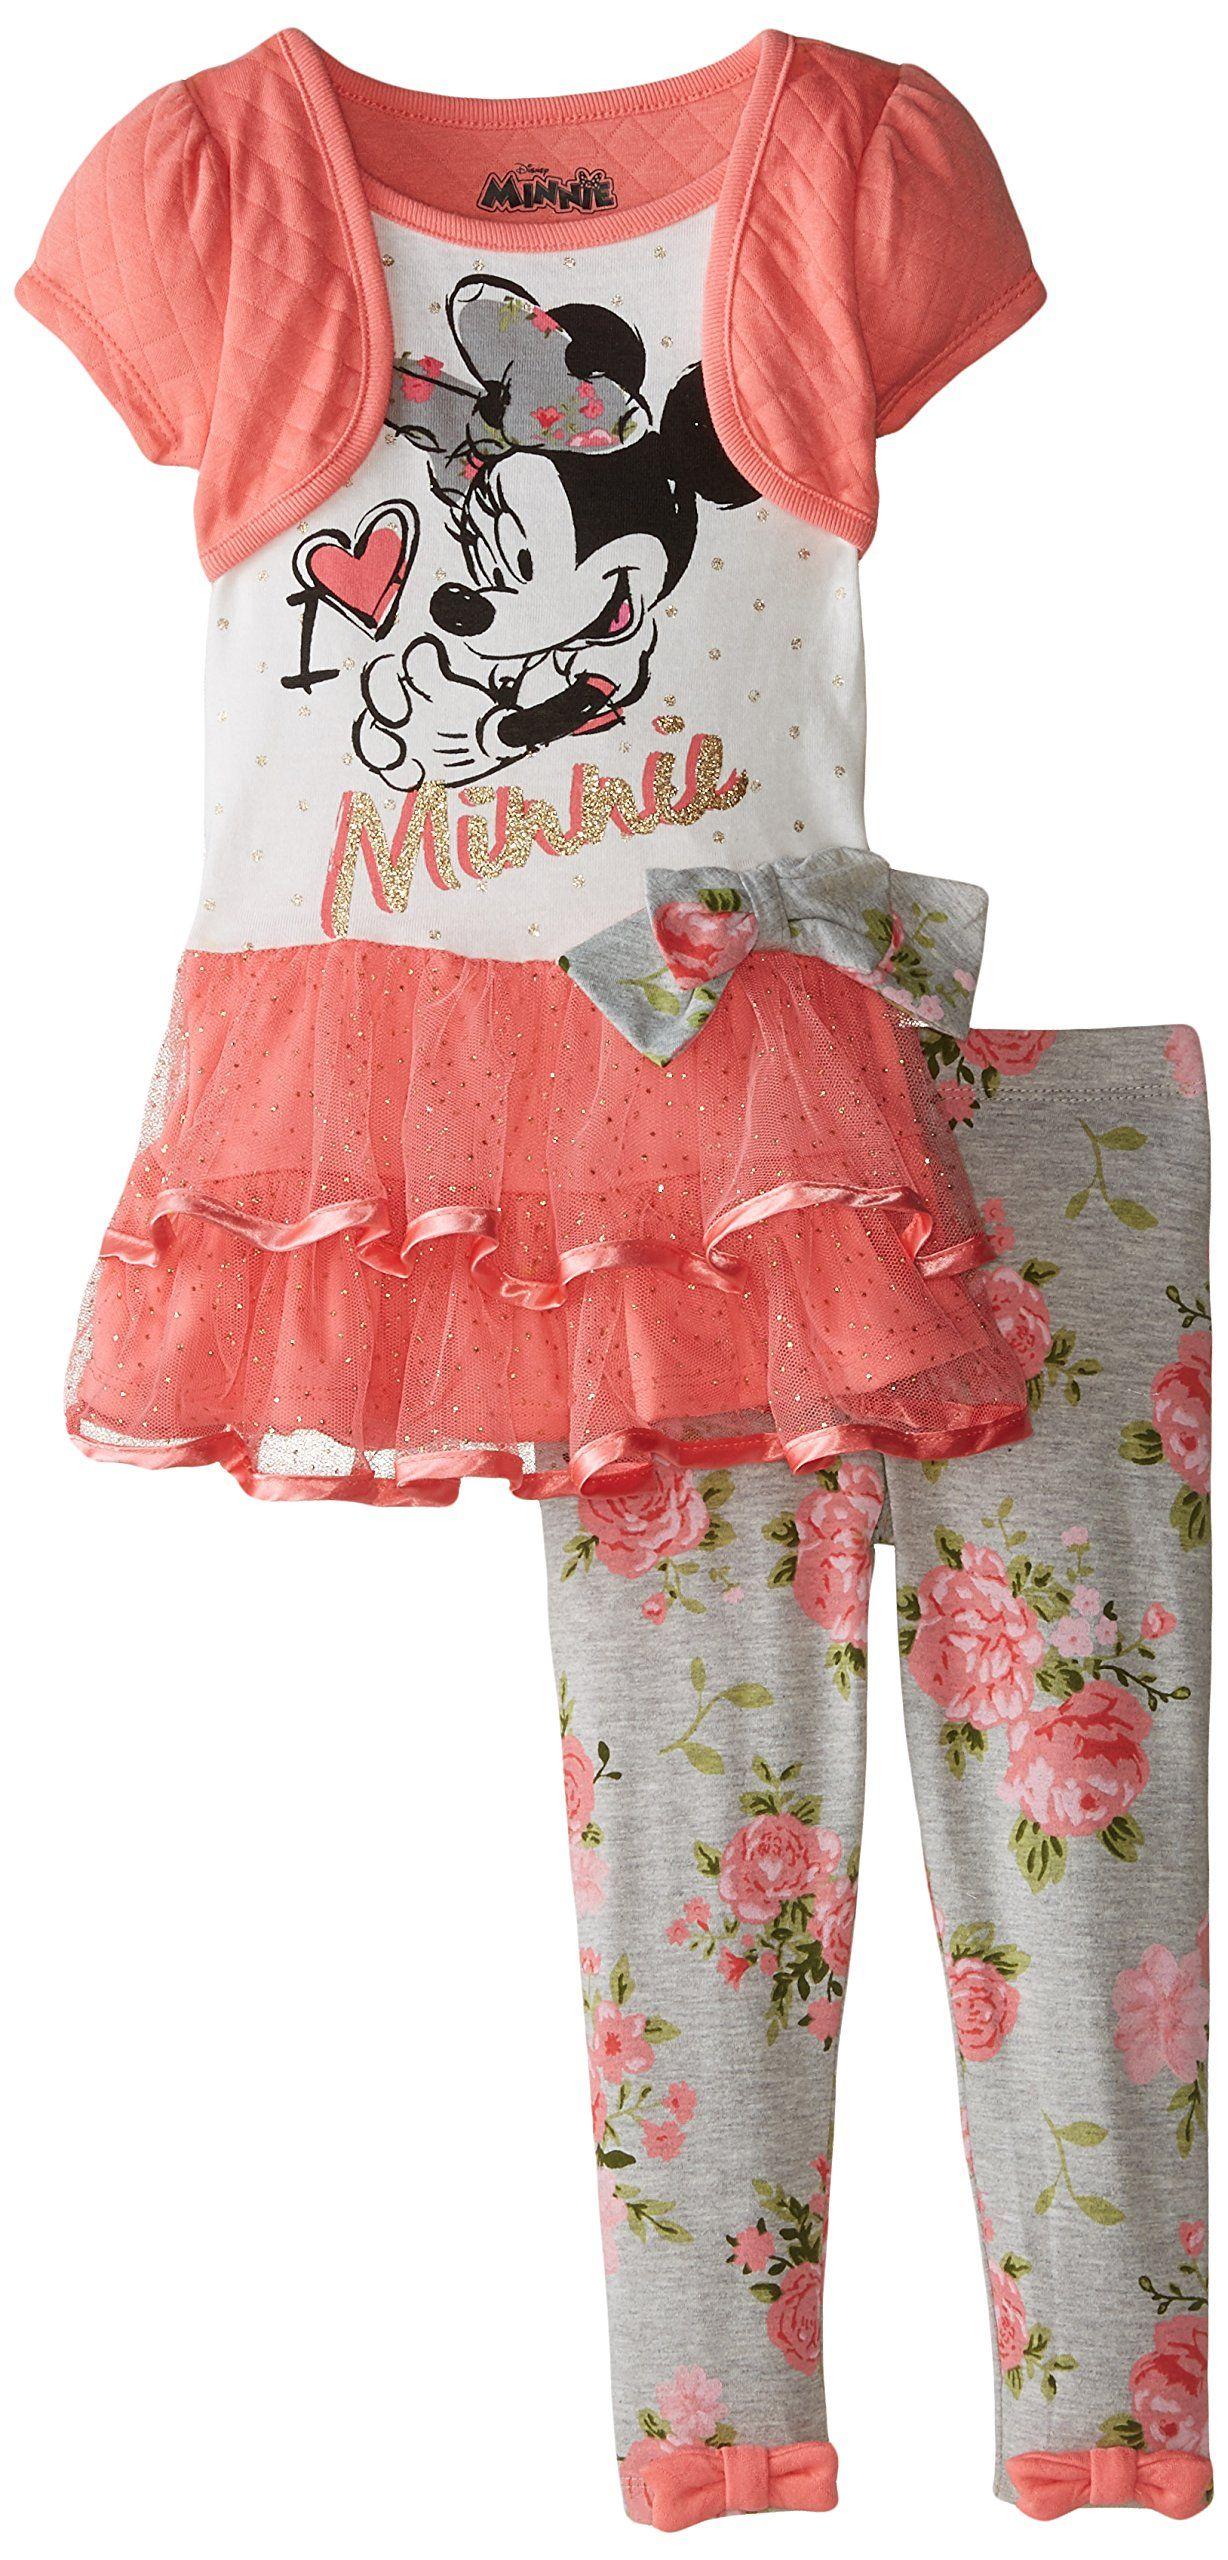 1d8c54dcb6887 Disney Girls' Minnie Mouse 2-Piece Legging Set, Orange, 5. Two-piece ...